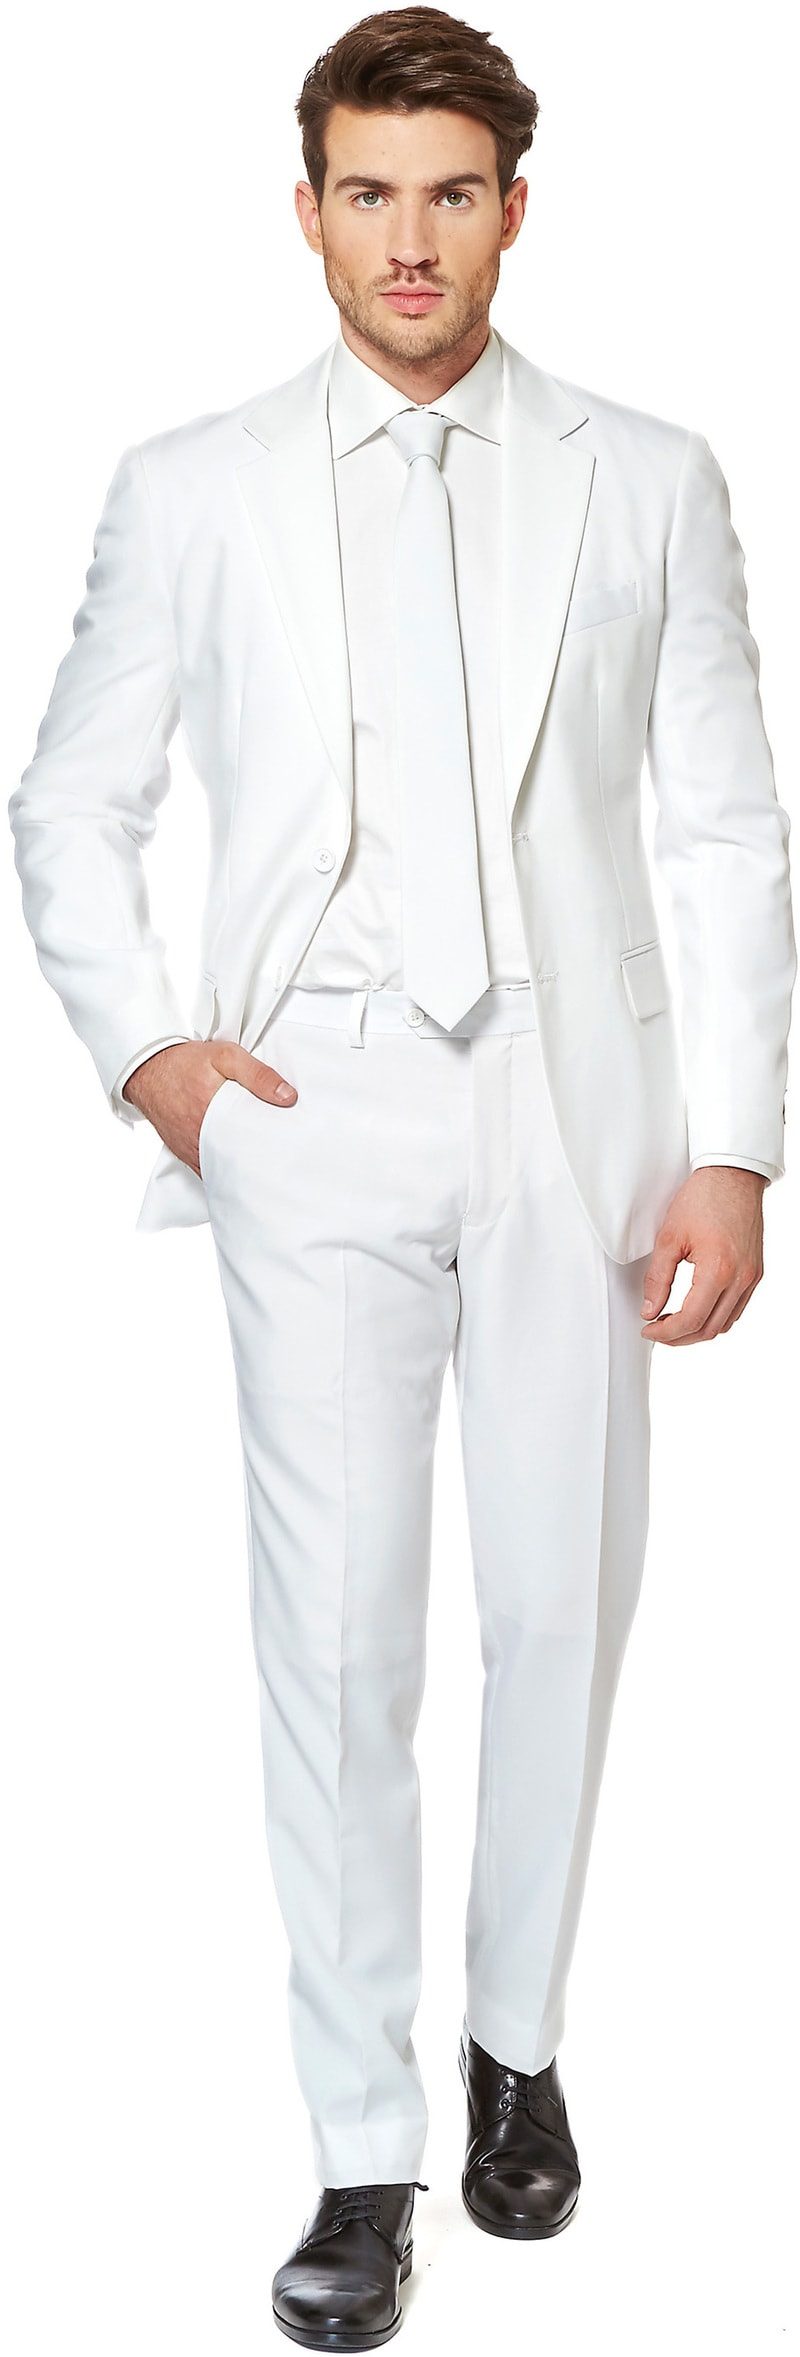 OppoSuits White Knight Anzug Foto 0